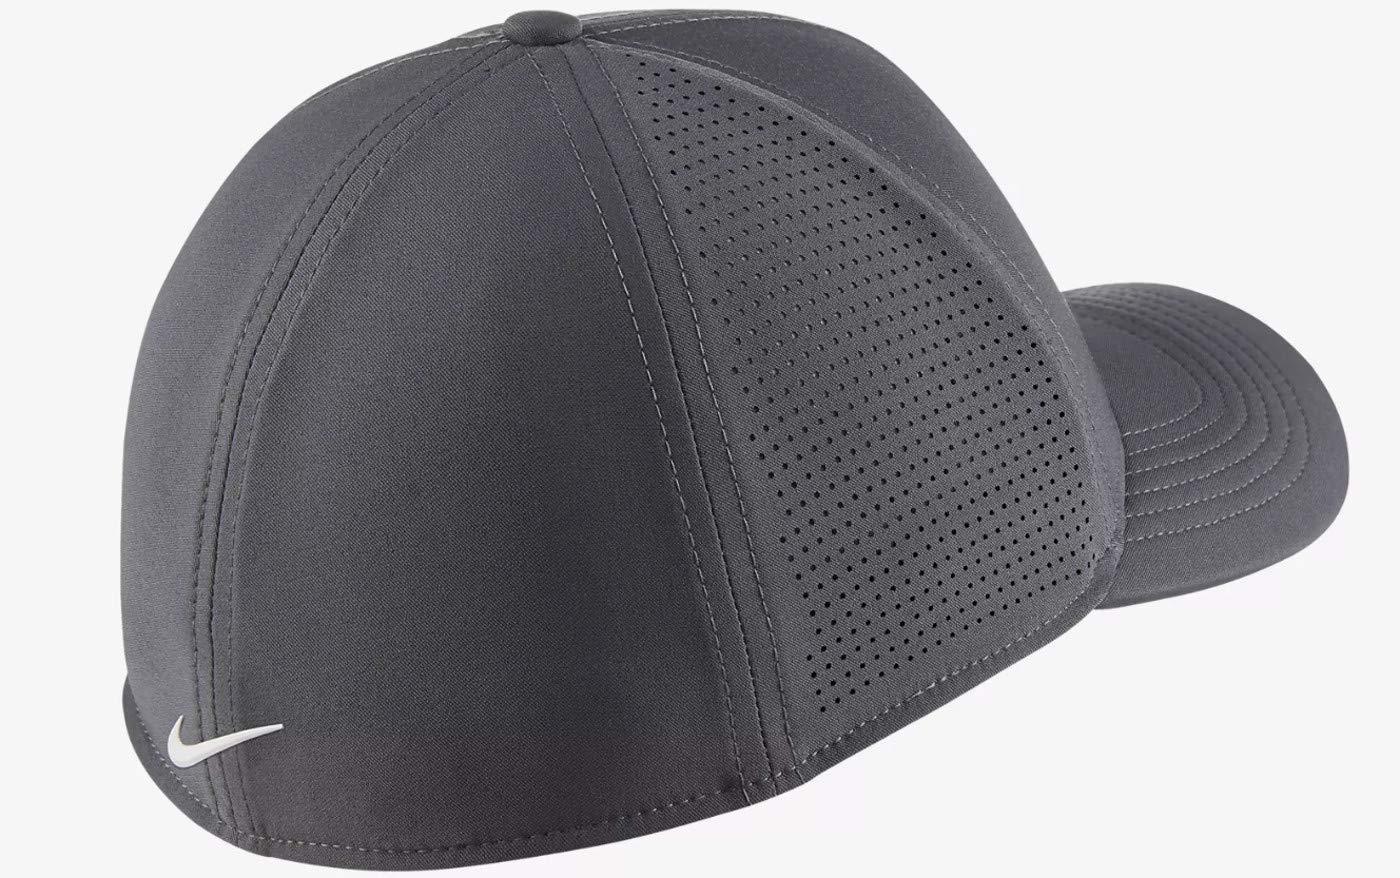 442a73e915ed Nike Men s Classic 99 Fitted Golf Hat